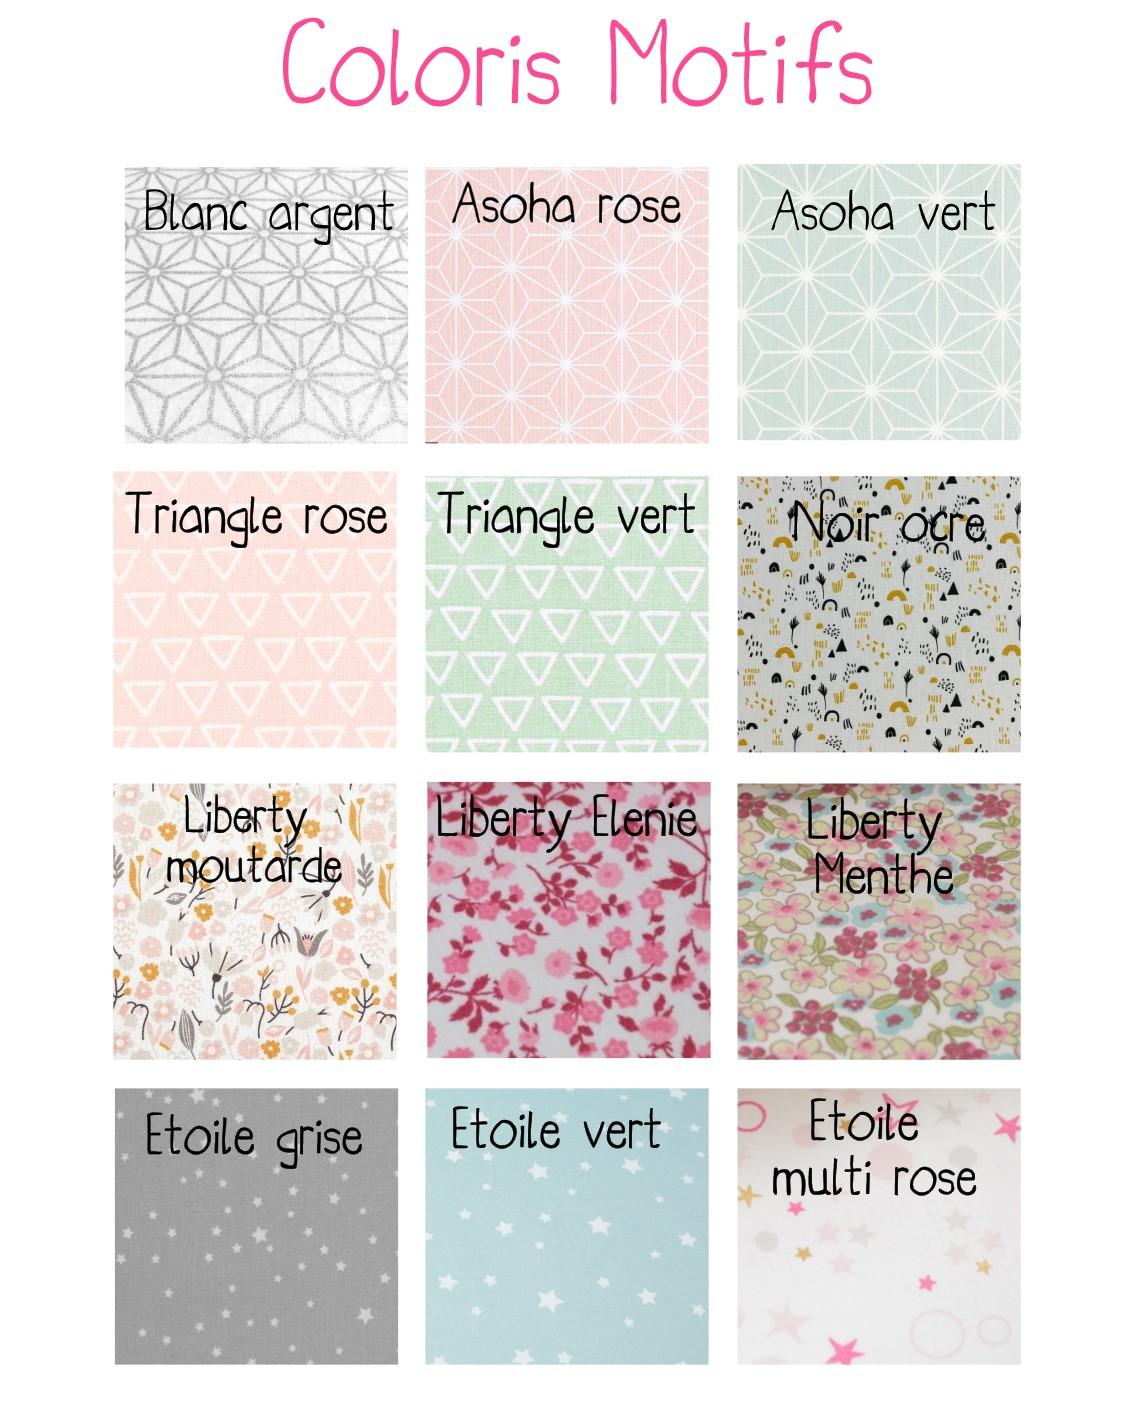 Coloris motifs